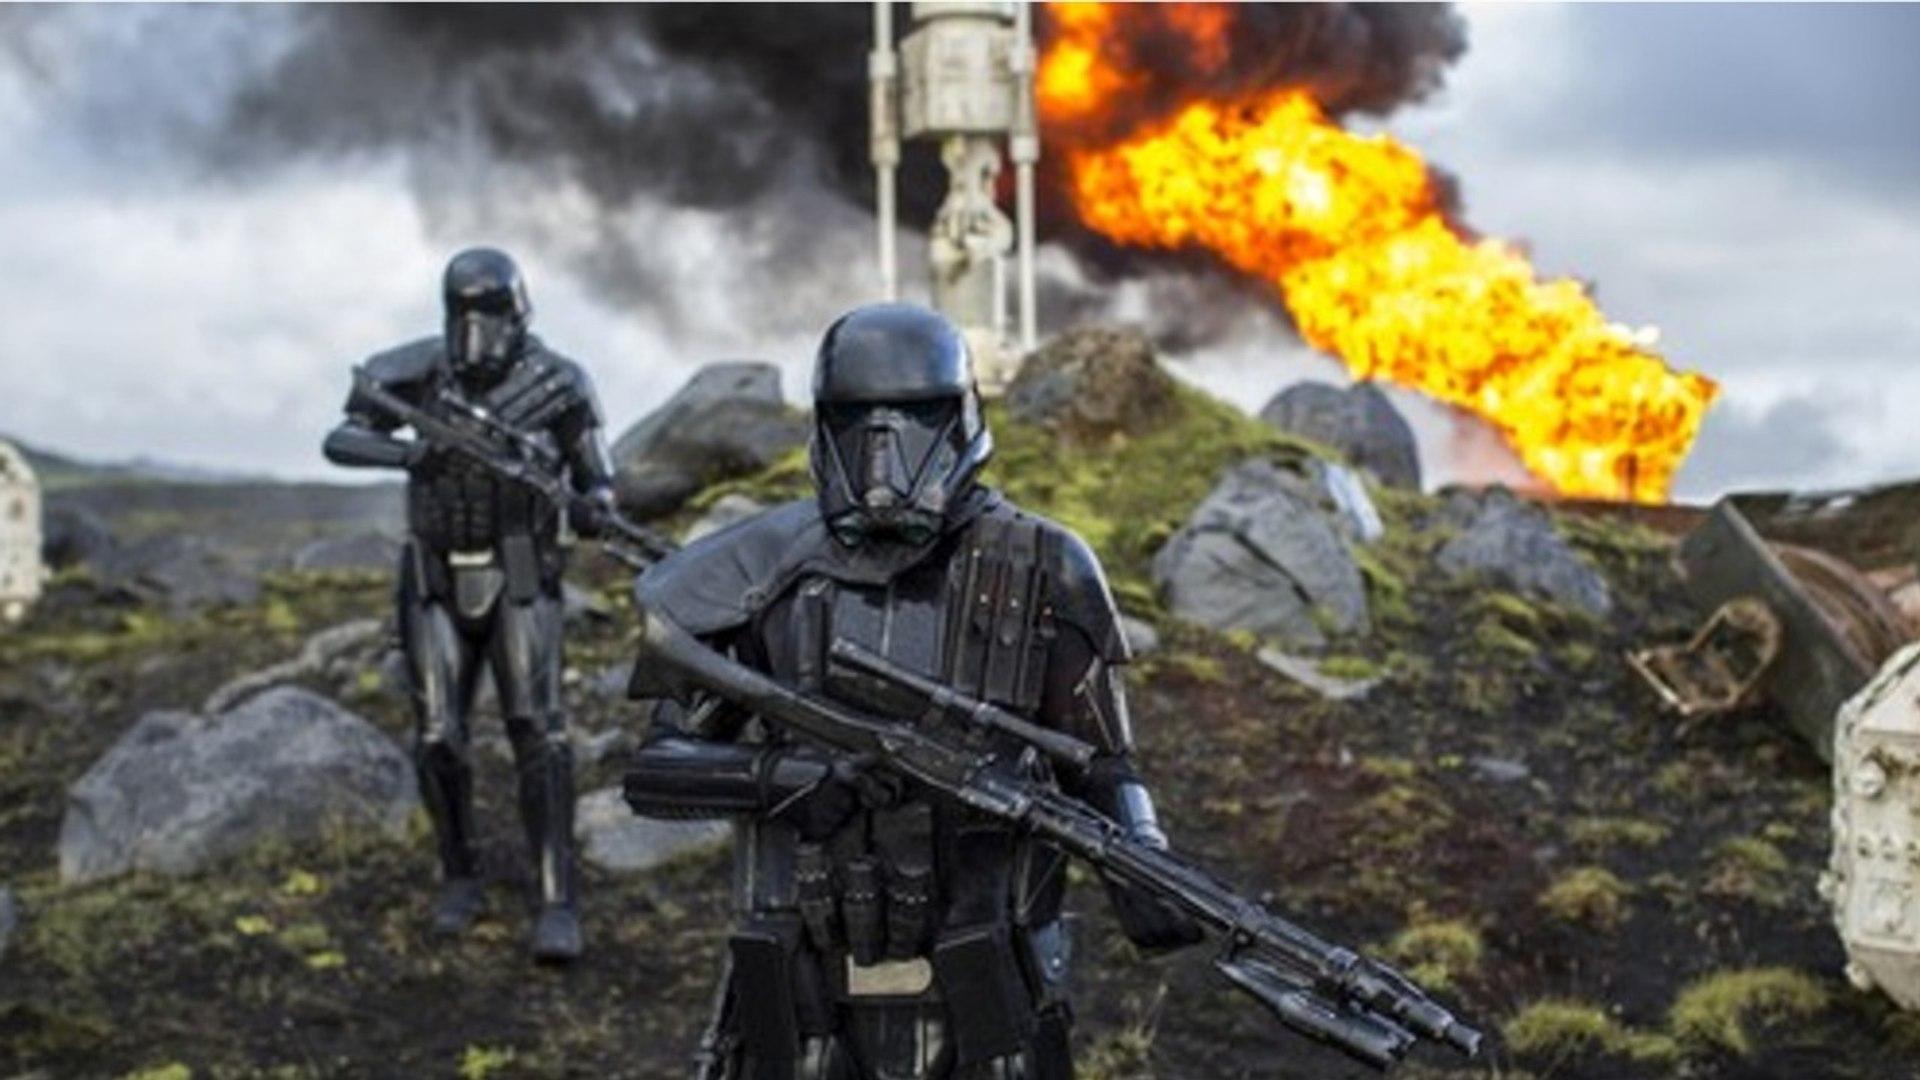 Death Trooper Rogue One Film 1920x1080 Wallpaper Teahub Io